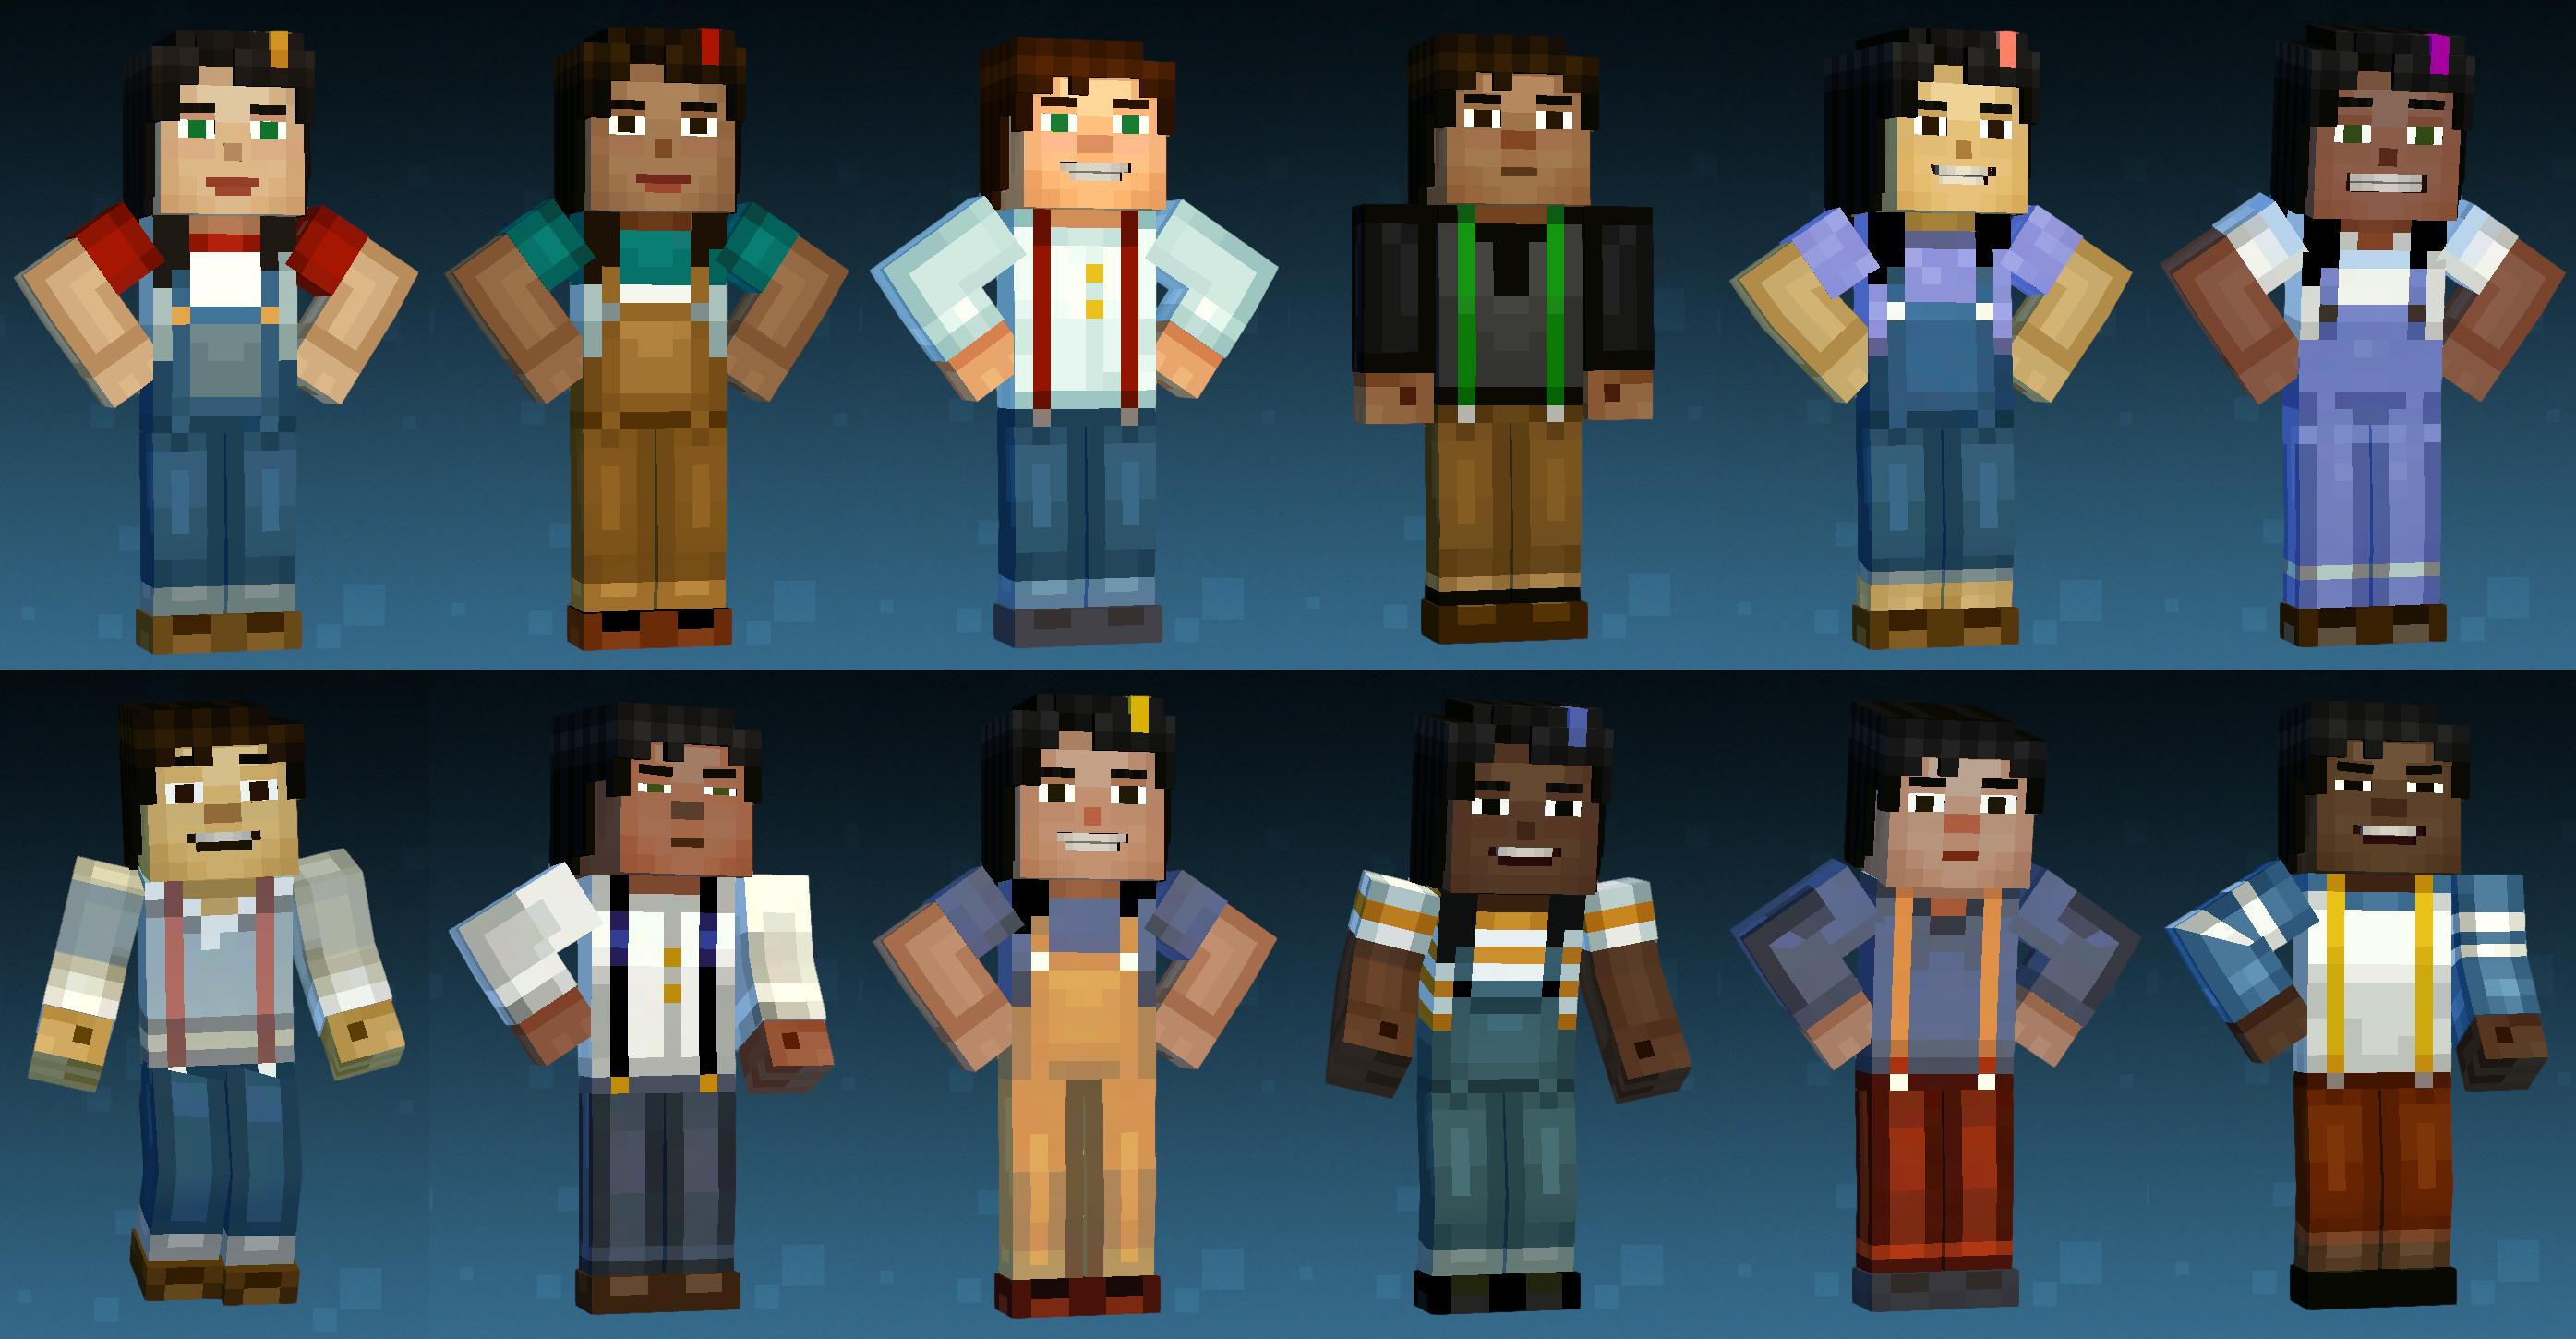 Minecraft Story Mode Season 2 Swiper Playbuzz